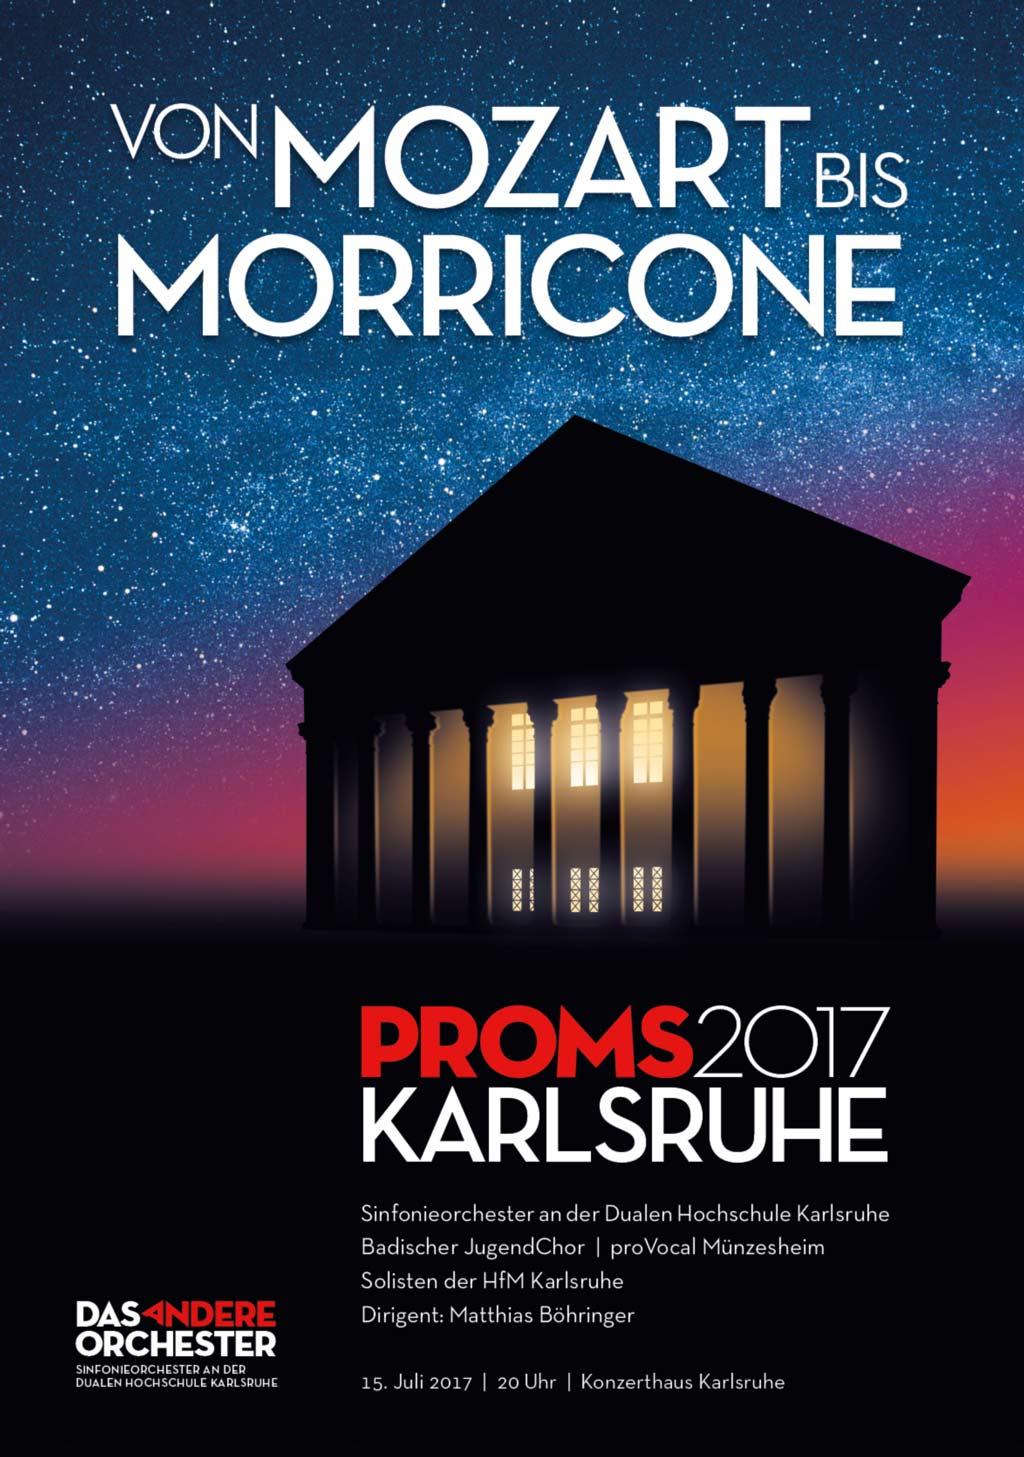 PROMS-karlsruhe-2017-web